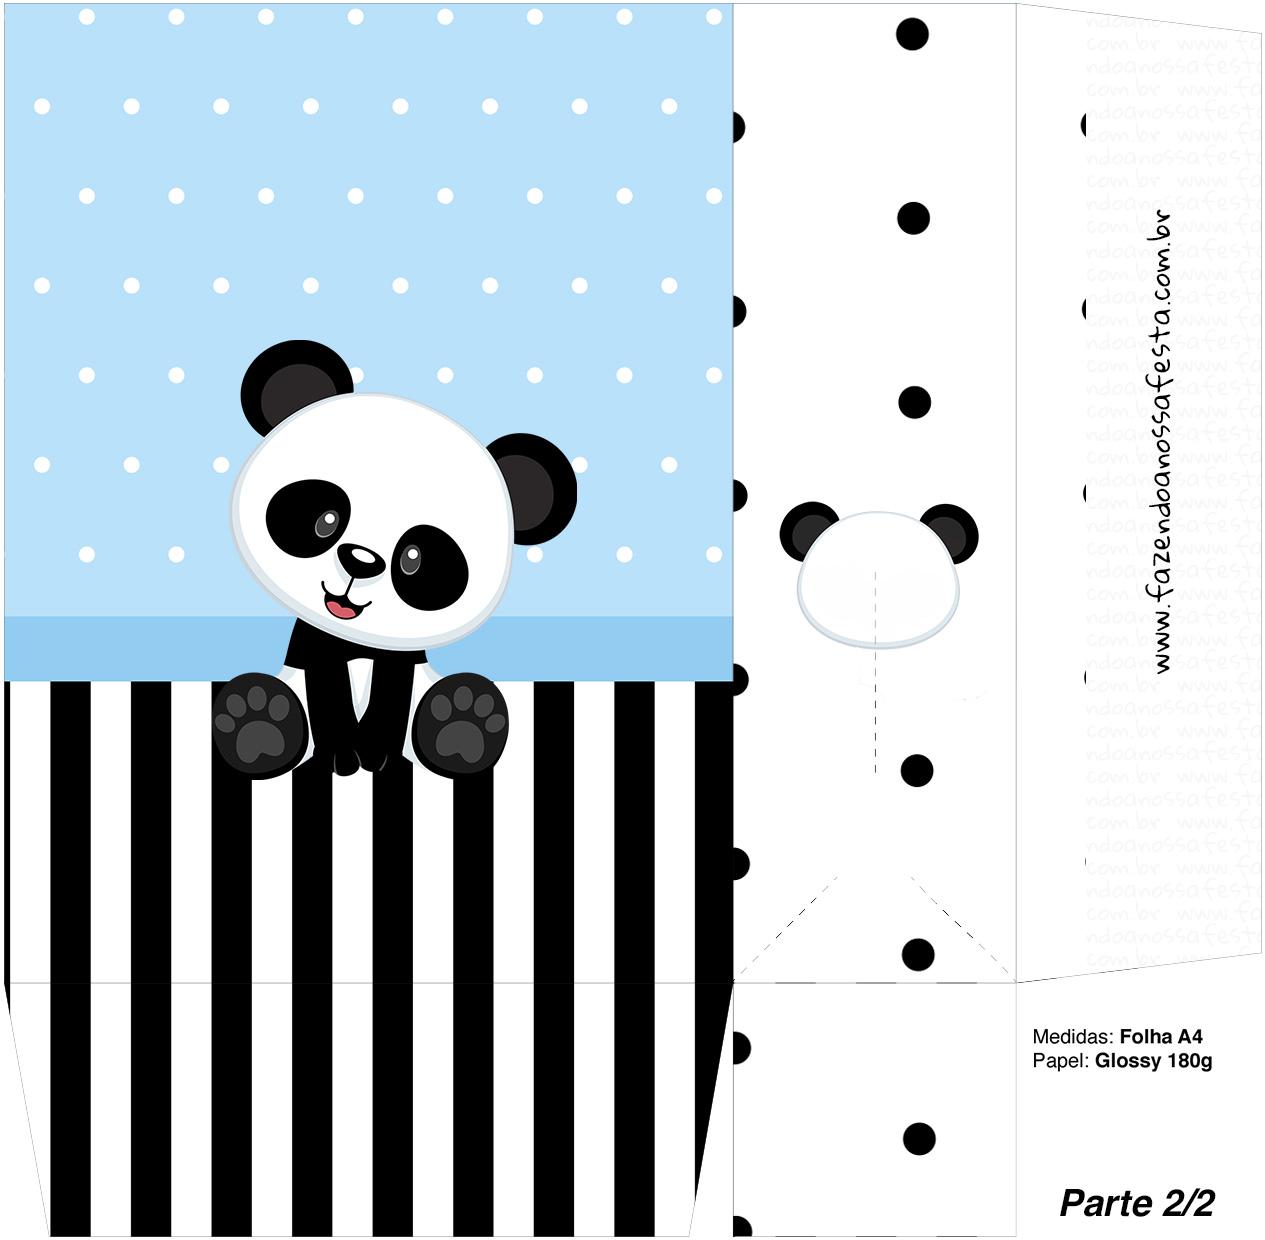 Sacolinha Surpresa 2 2 Panda Azul Menino